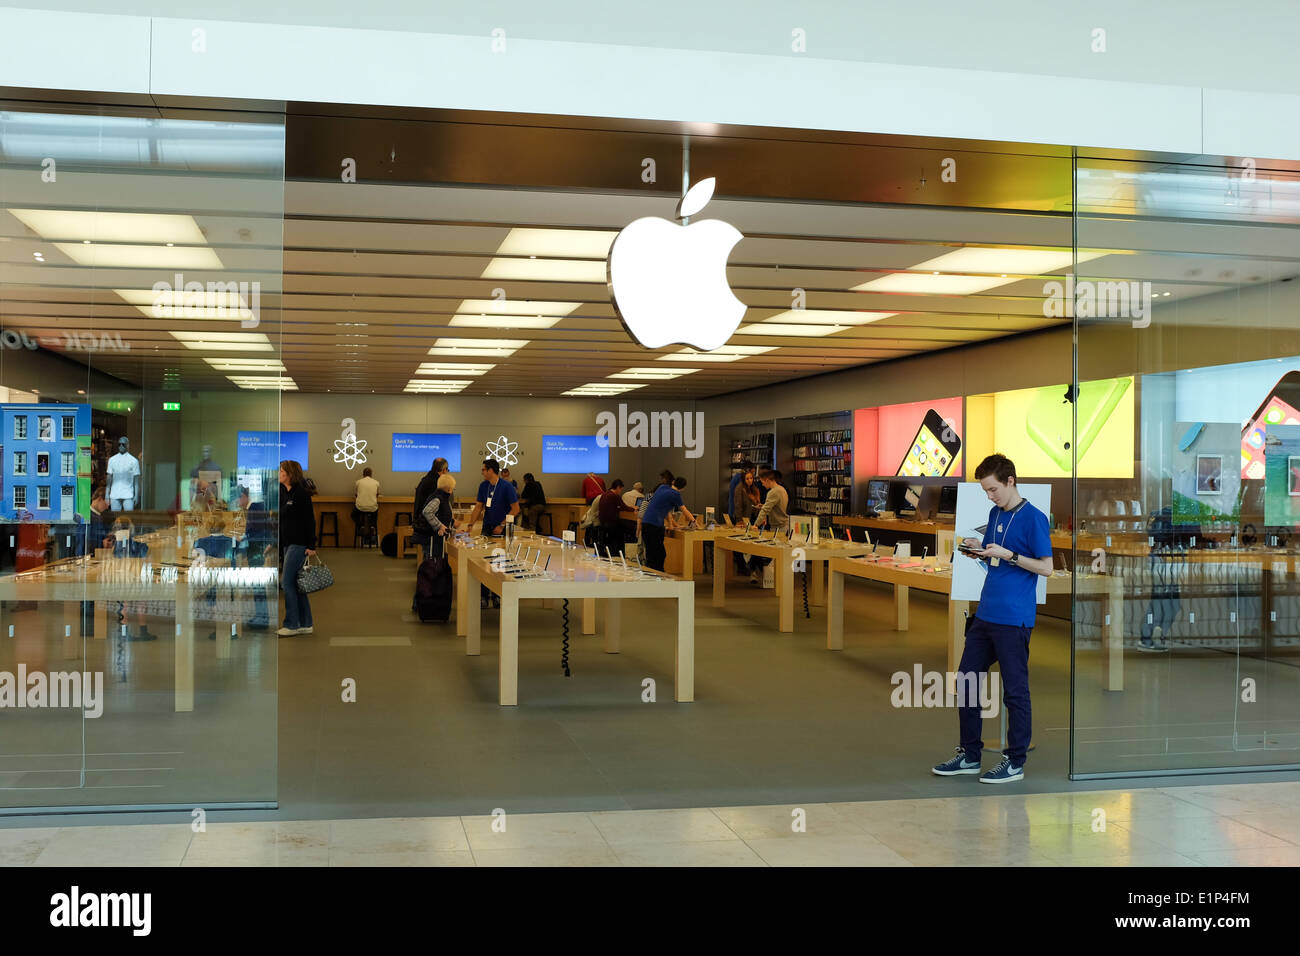 Uk Apple Store Stock Photos & Uk Apple Store Stock Images - Alamy